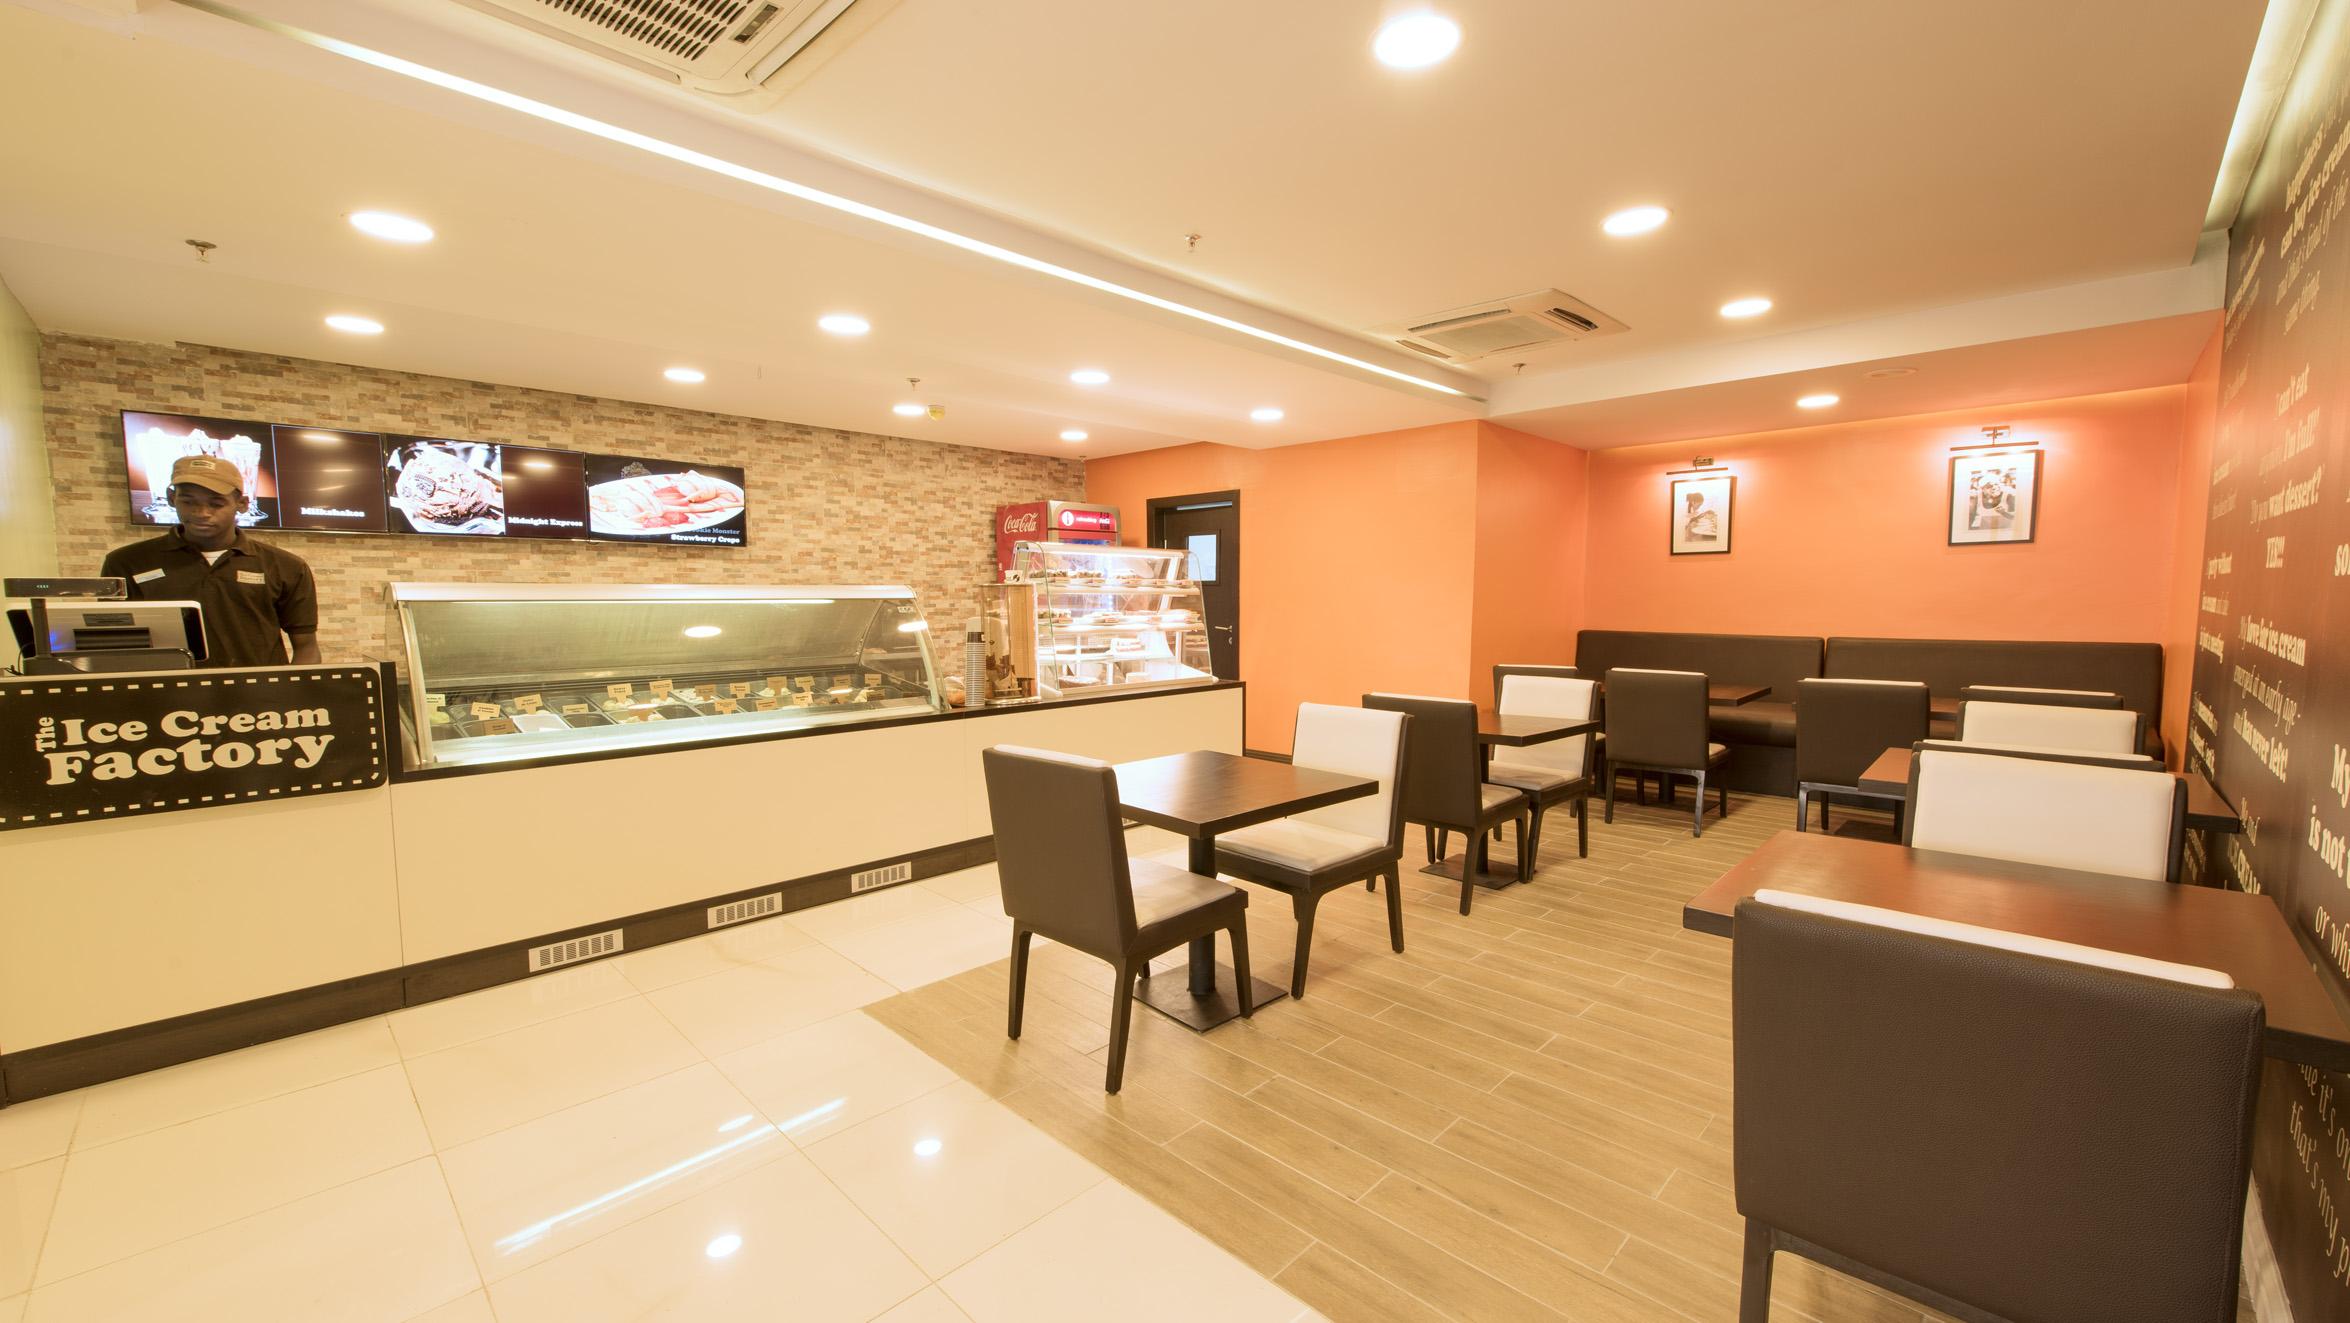 Ice cream factory maryland shopping mall